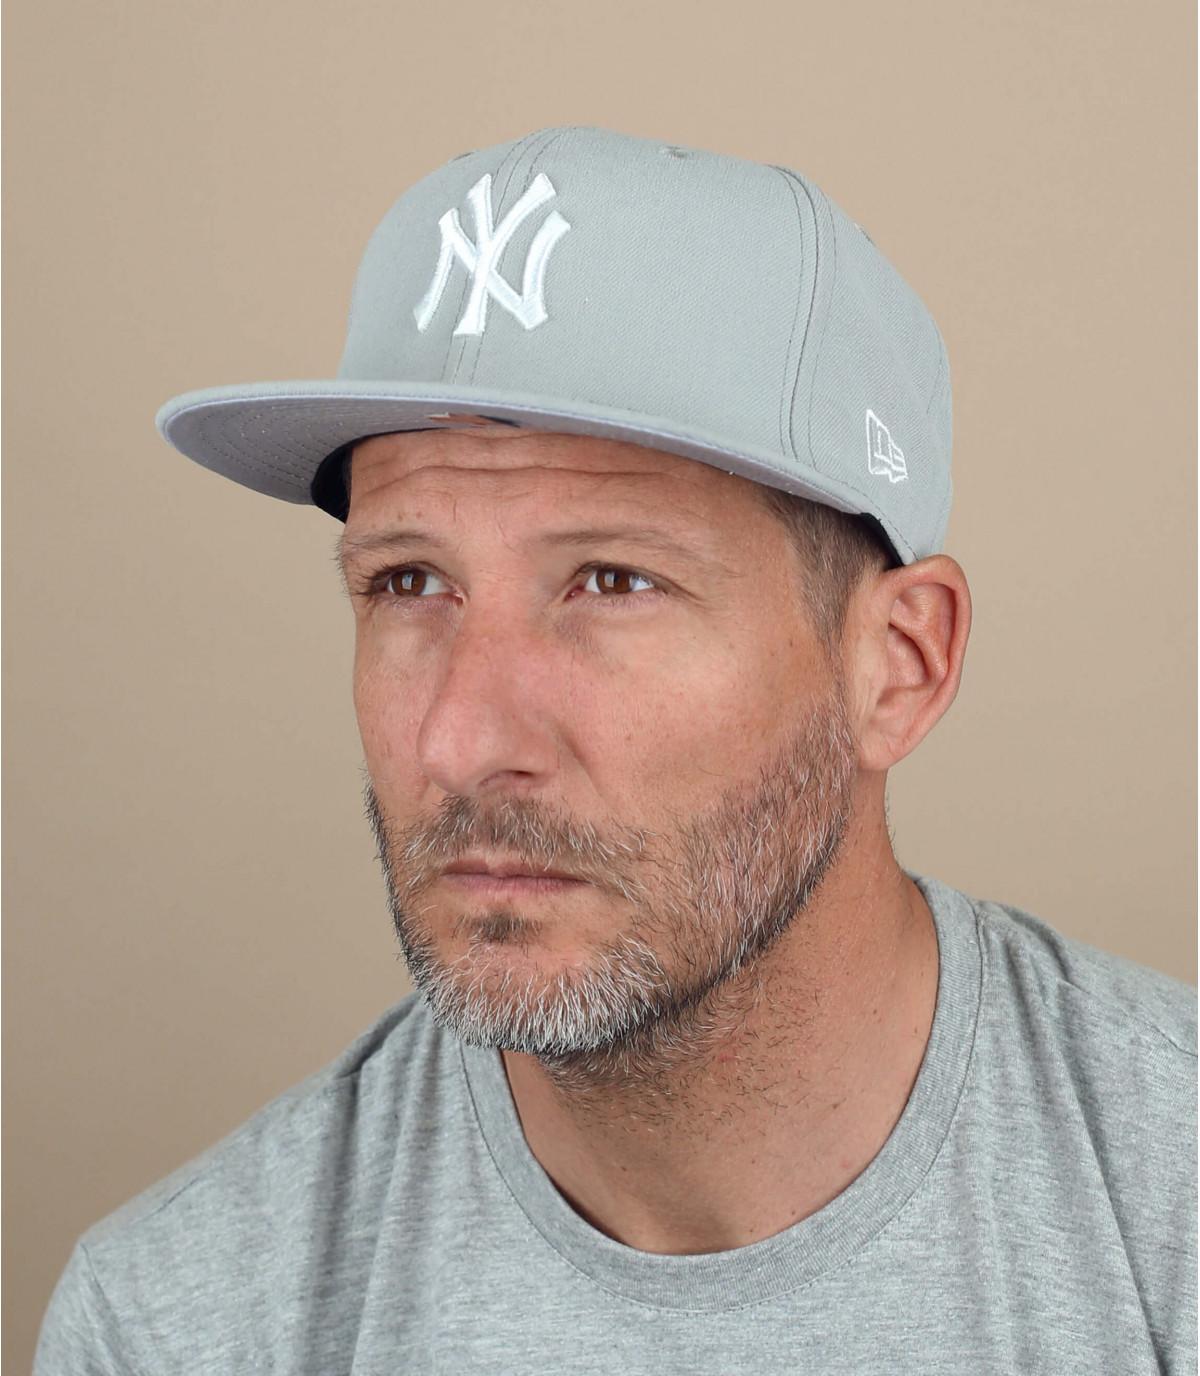 MLB Basic New York light grey